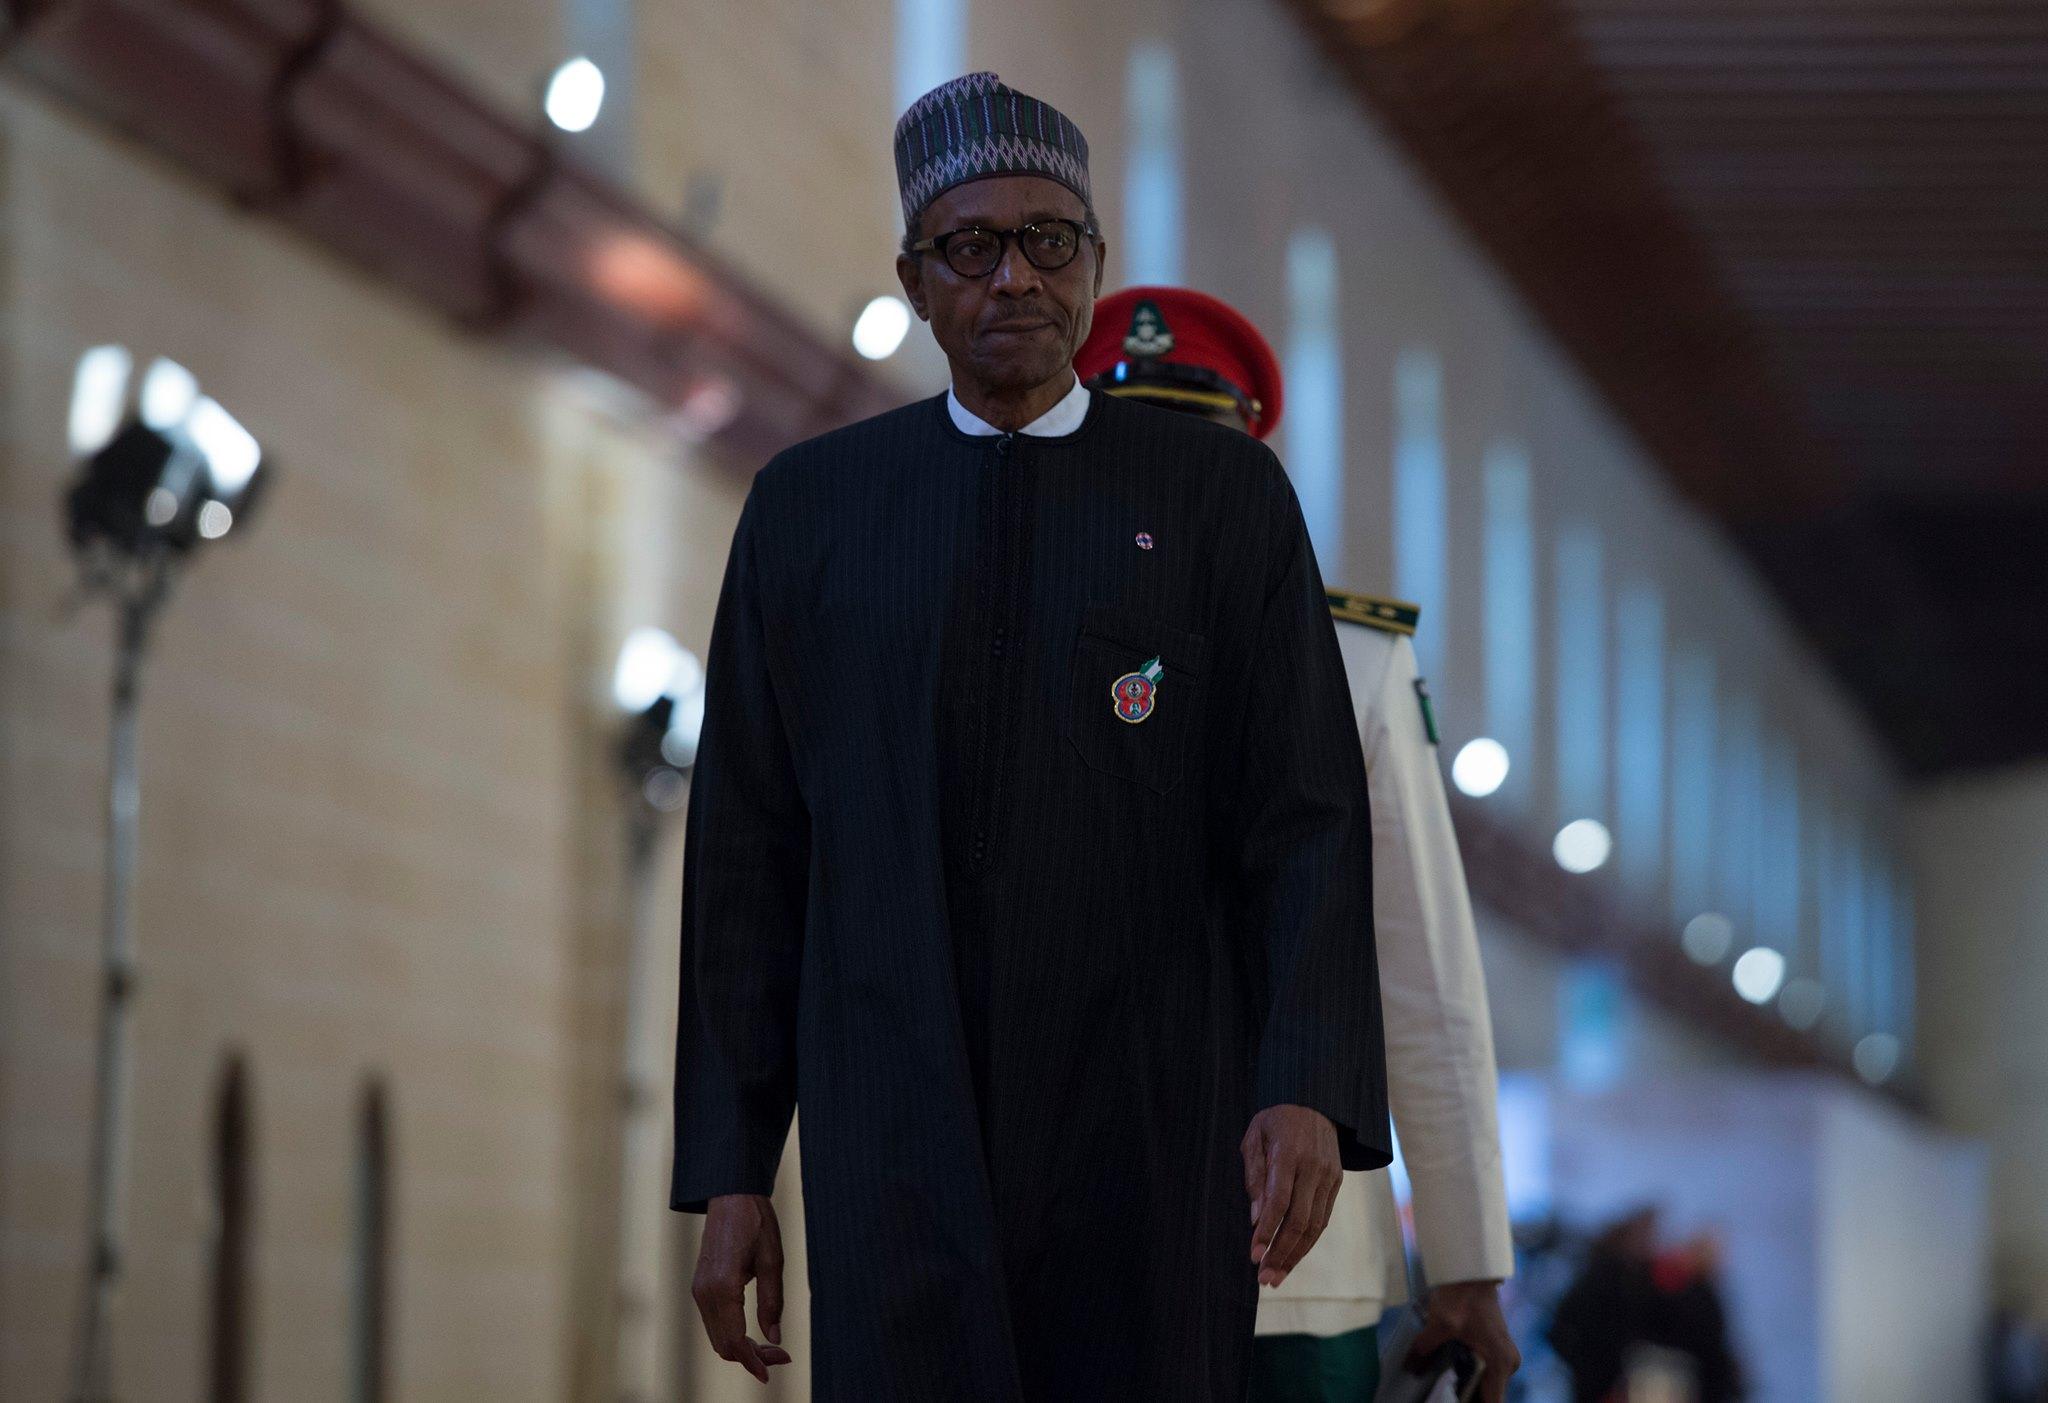 Buhari's independence day speech challenges Nigerians to make change happen